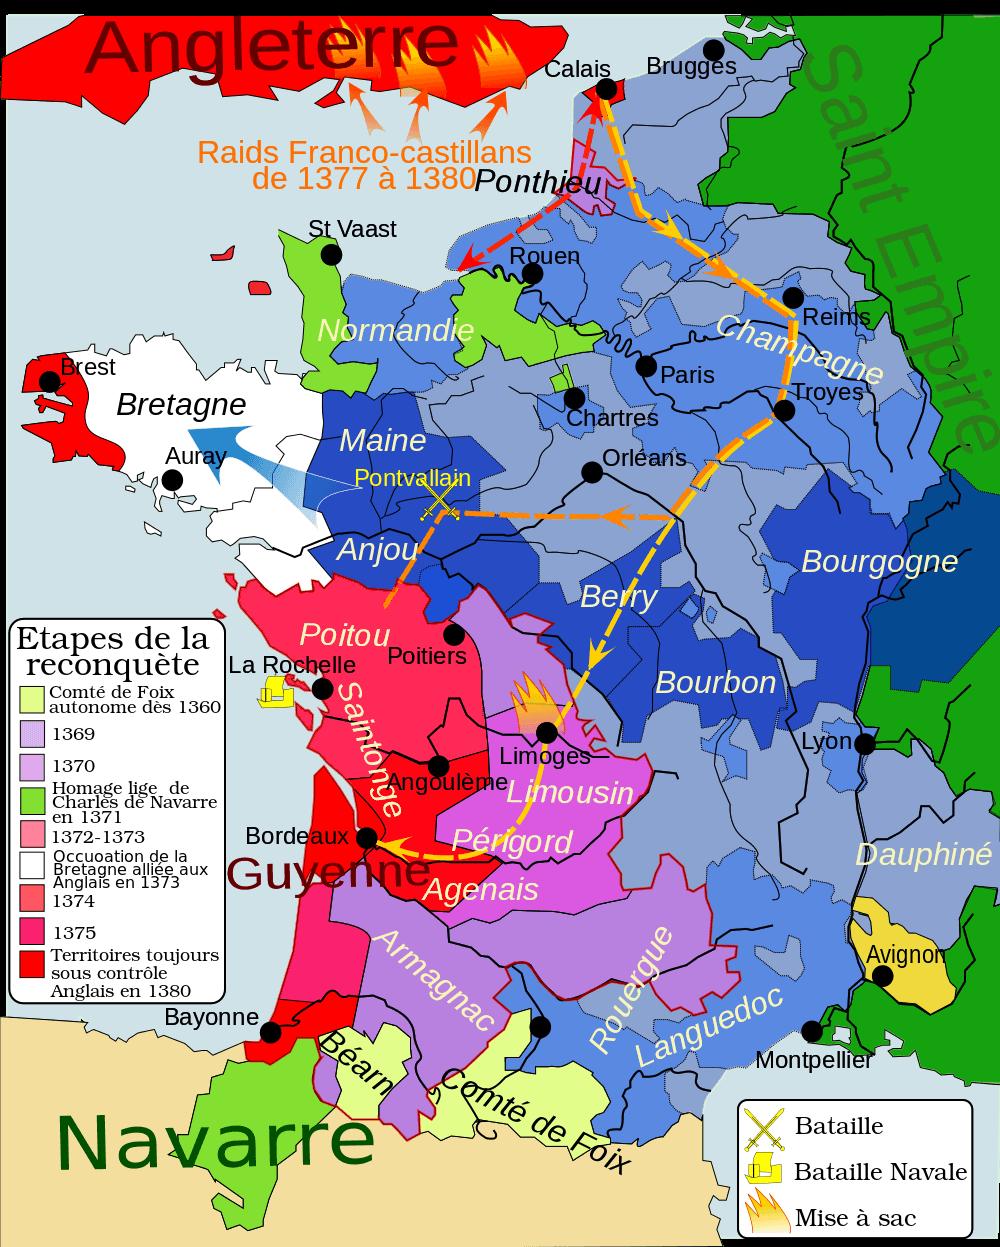 Mapa de Francia 1364-1380. Fuente http://www.cartesfrance.fr/